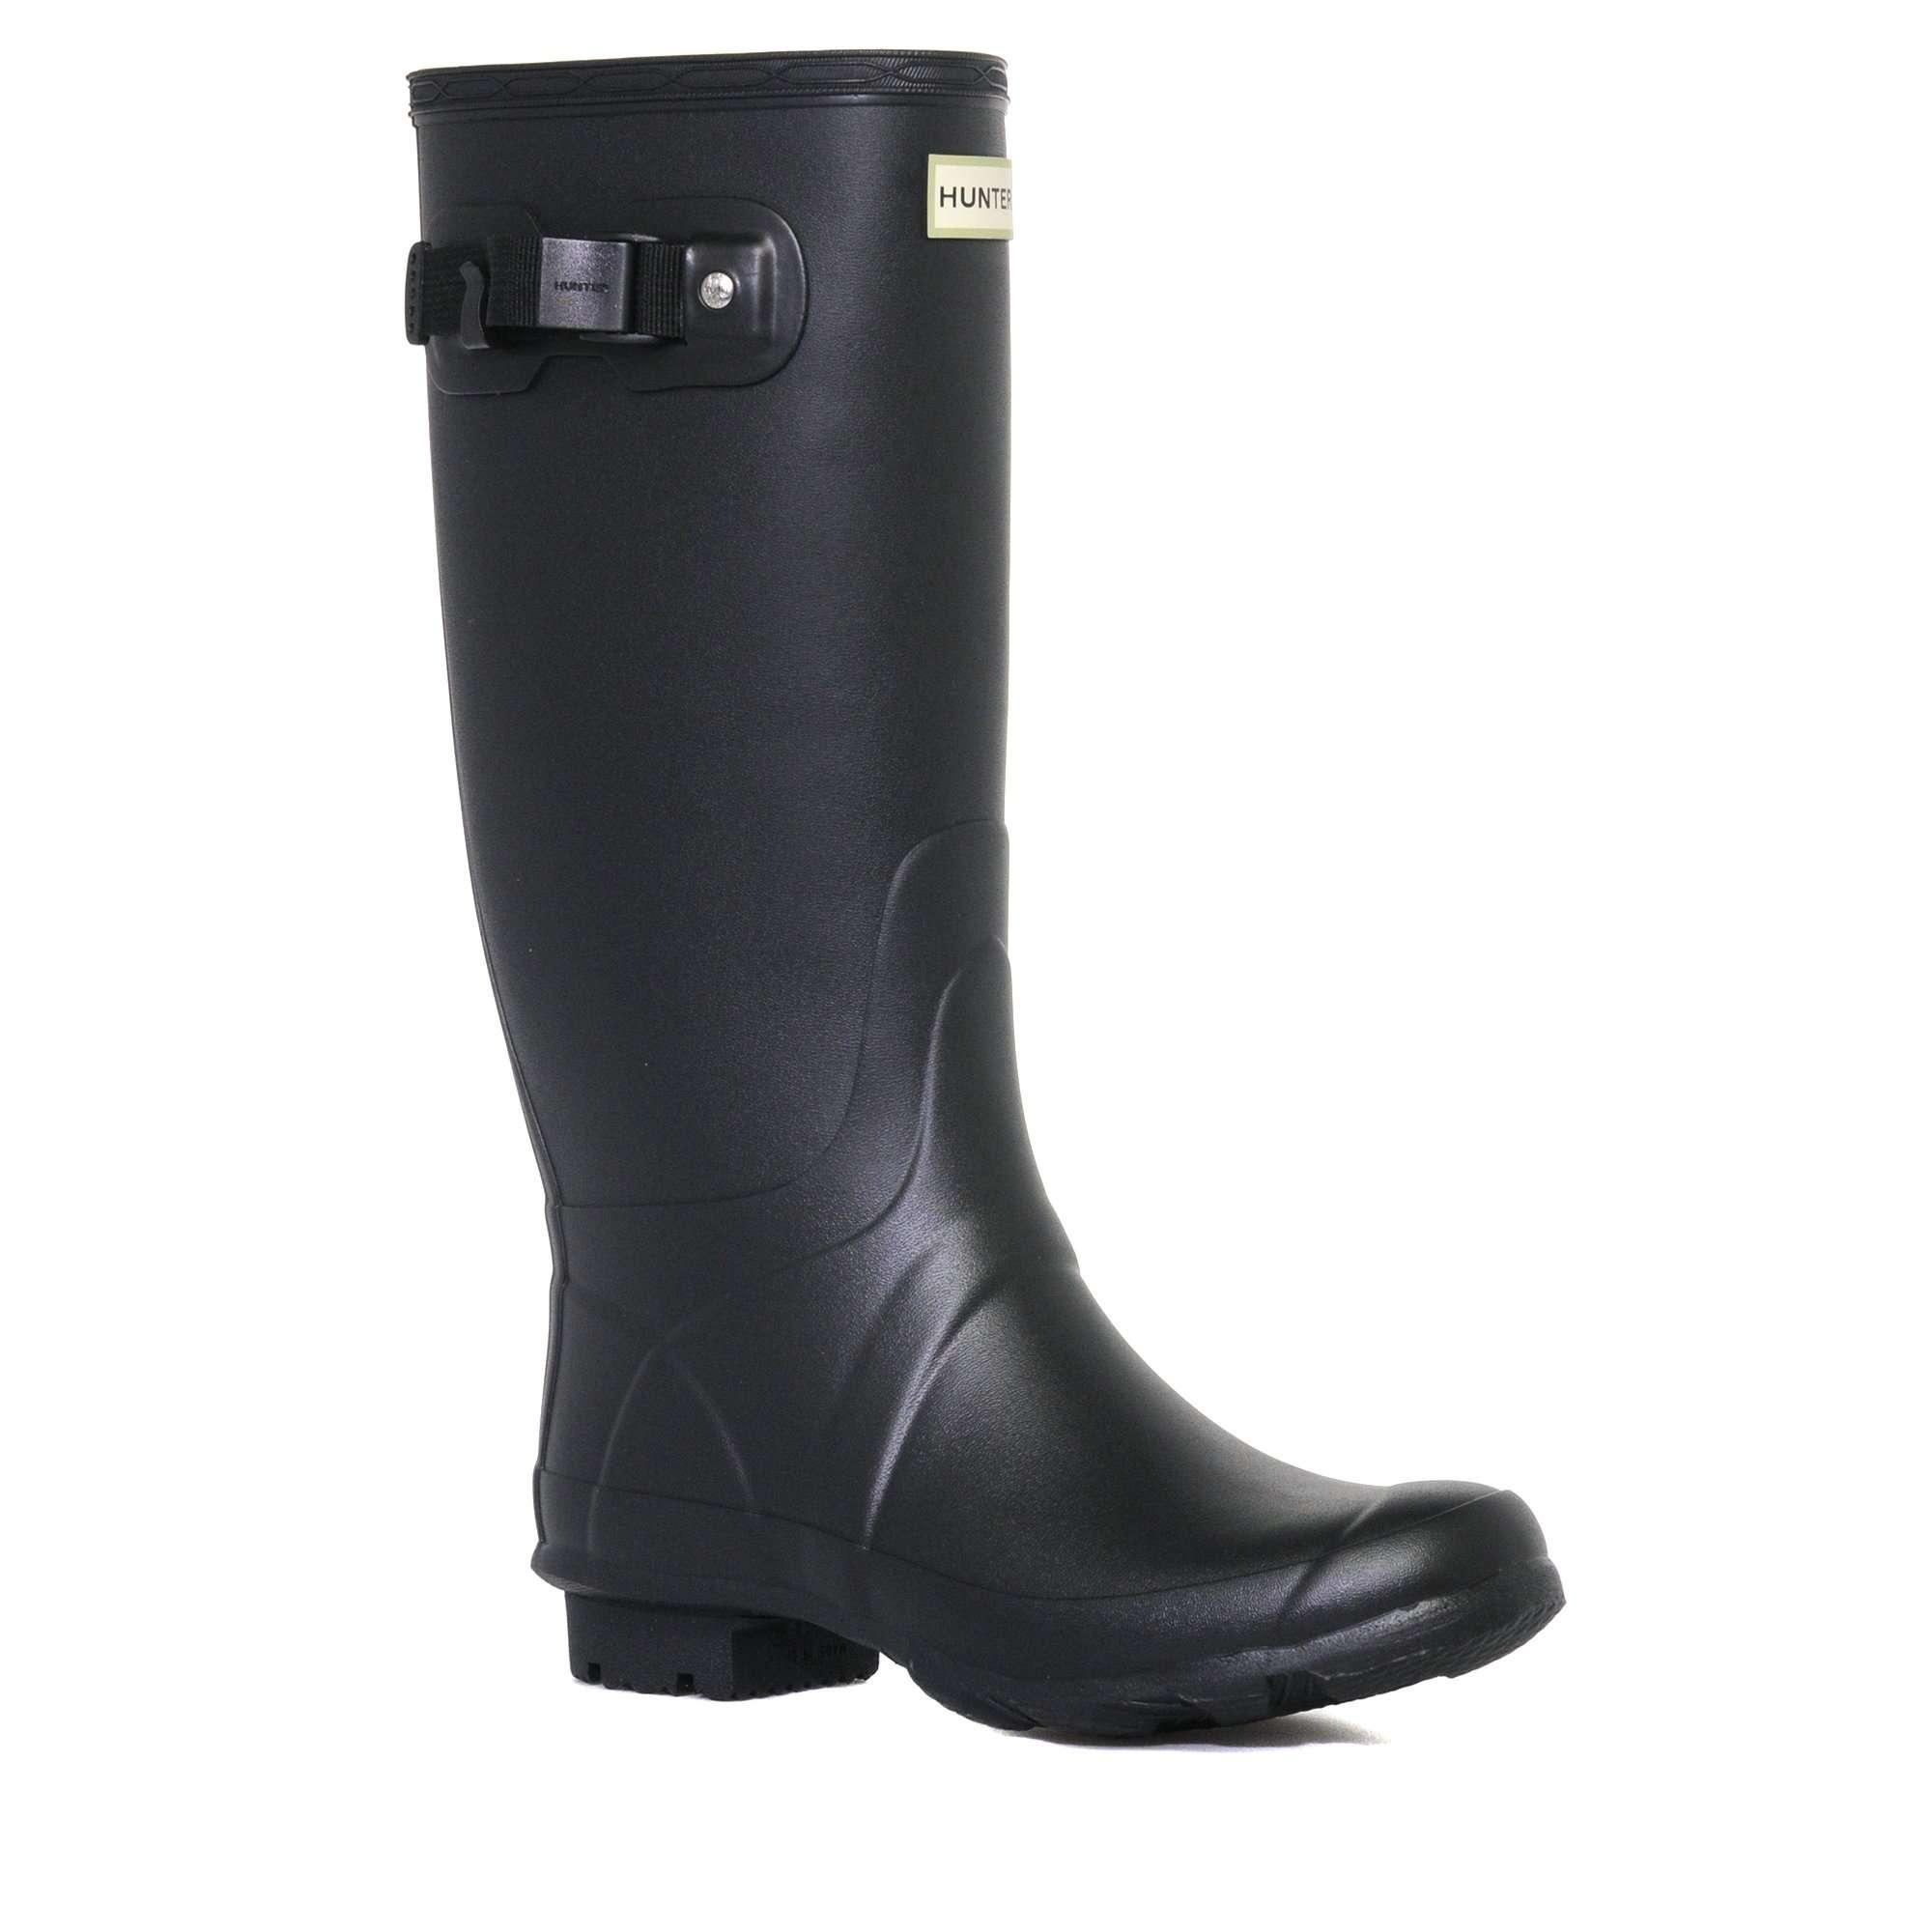 HUNTER Women's Field Huntress Wellington Boot